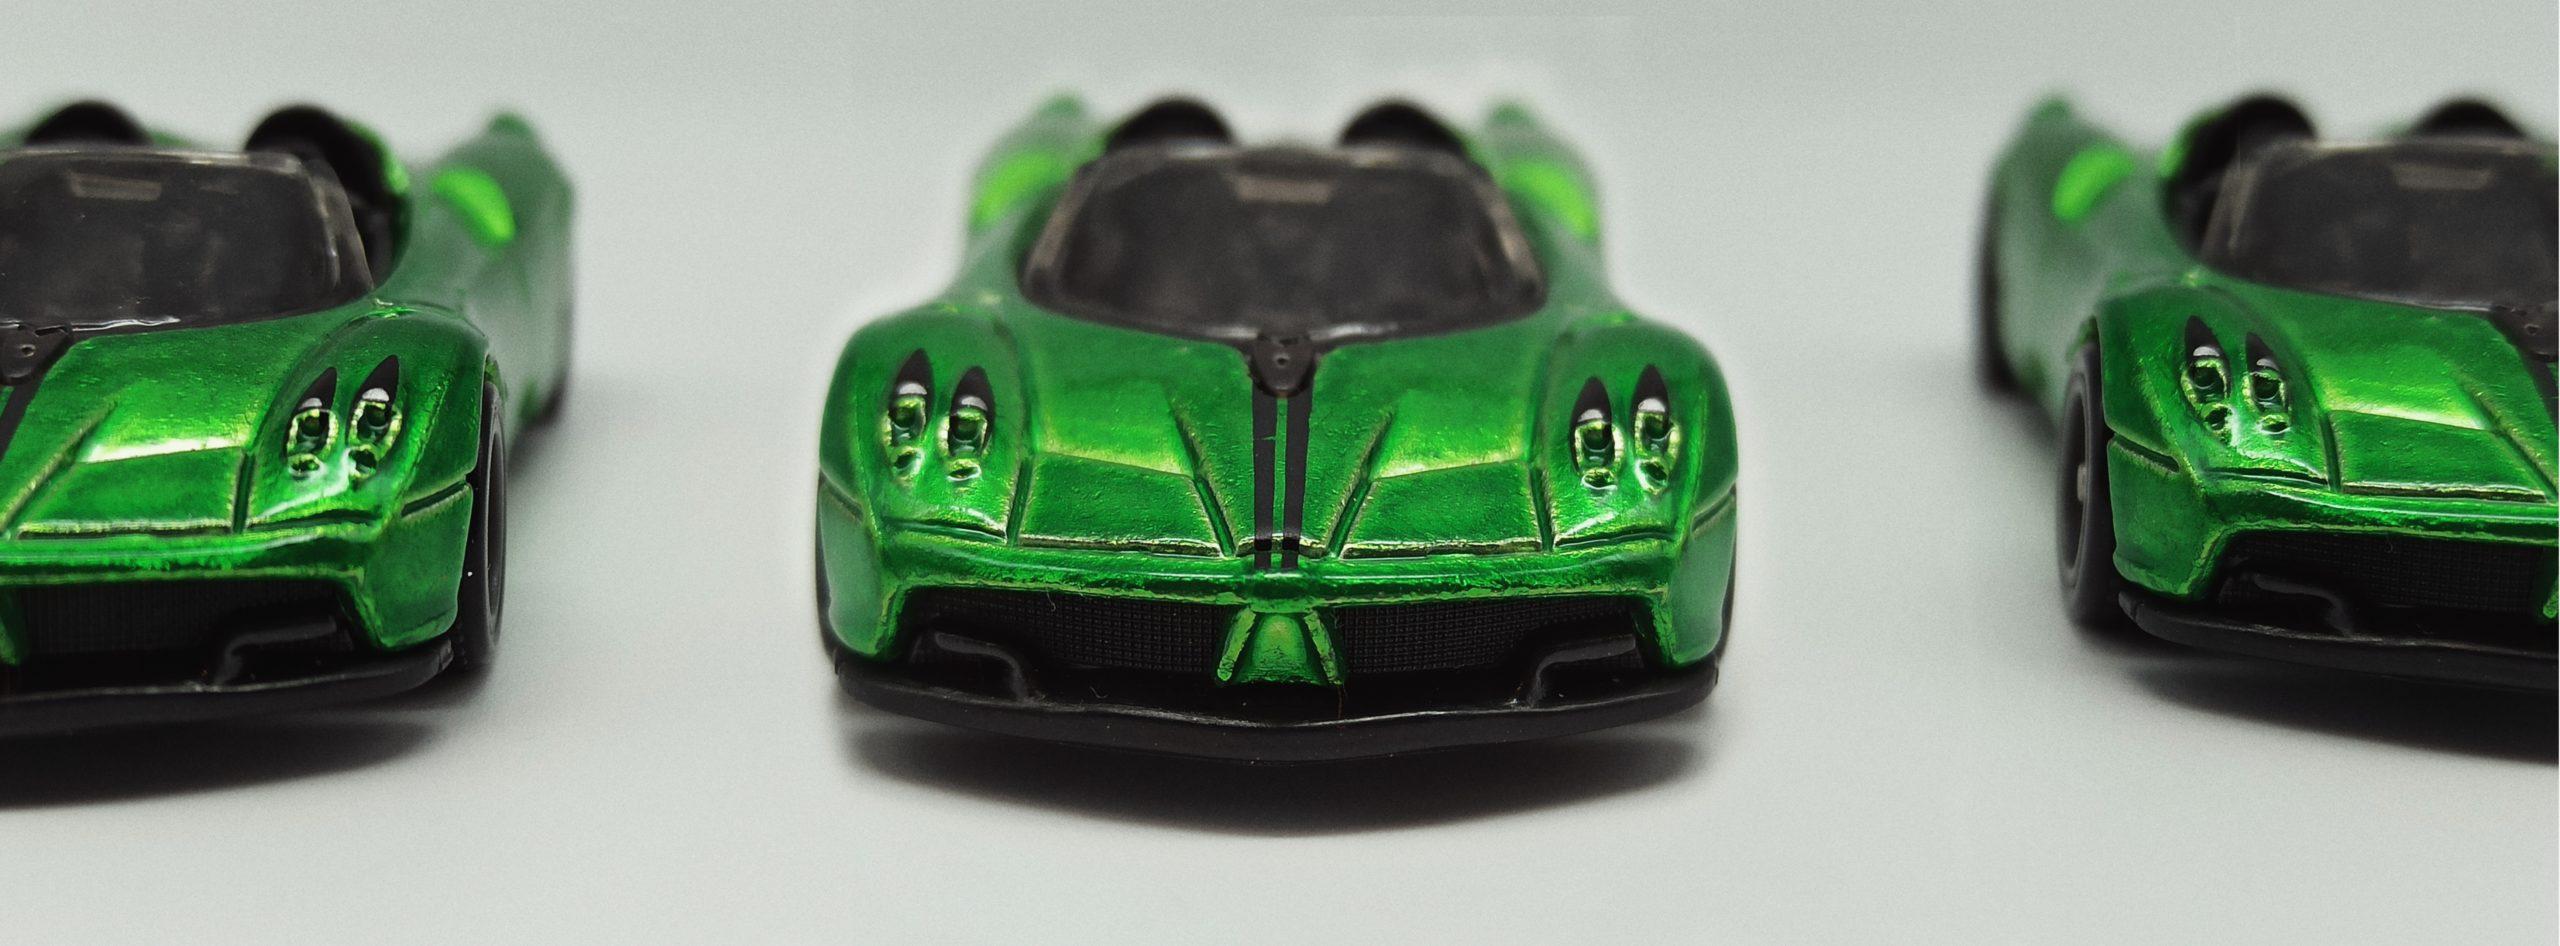 Hot Wheels '17 Pagani Huayra Roadster (GHG21) 2020 (241/250) HW Roadsters (5/5) spectraflame green Super Treasure Hunt (STH) triplets